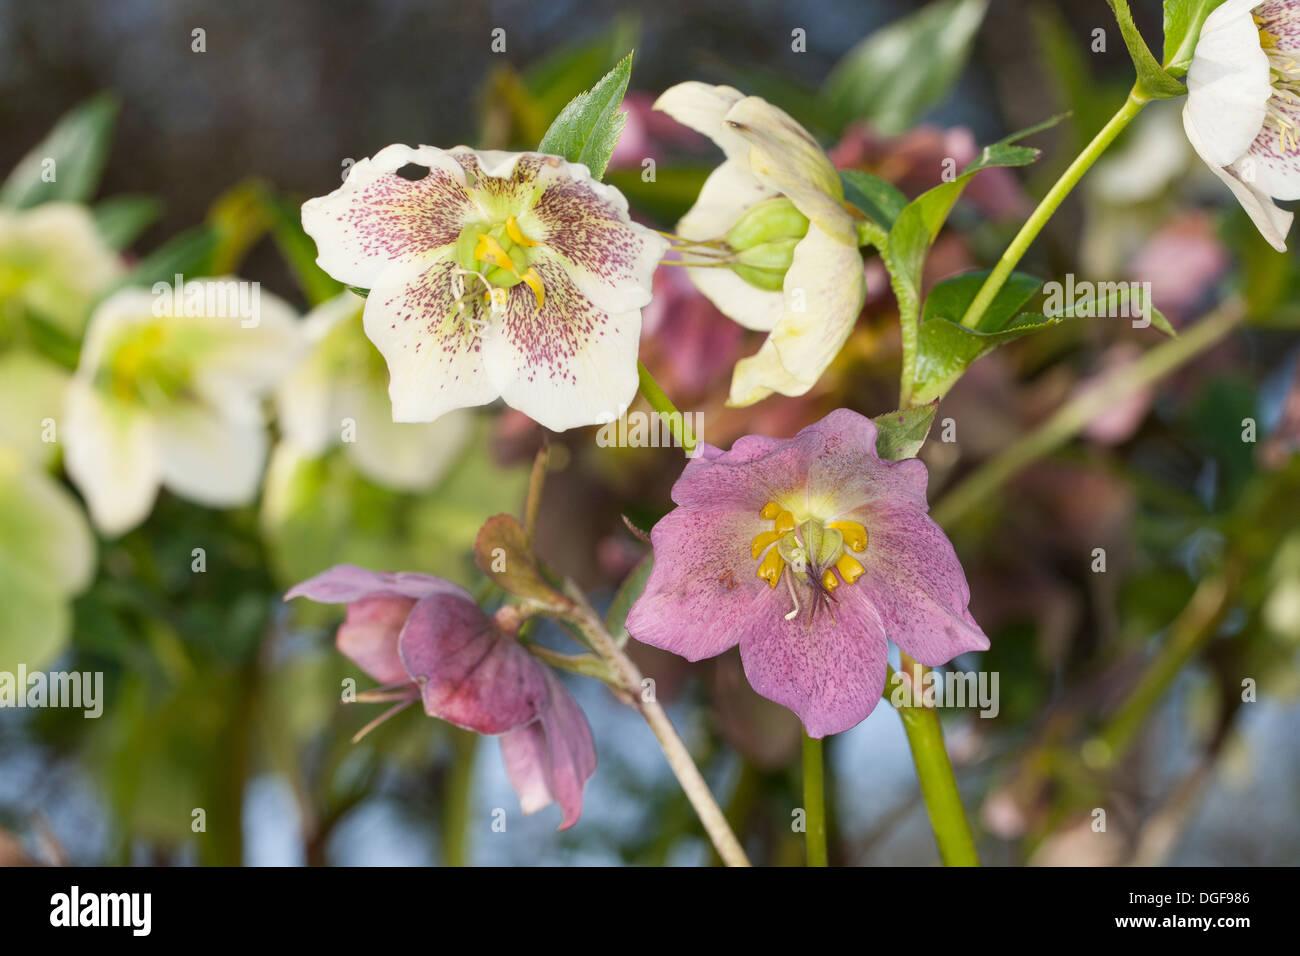 Christmas rose, black hellebore, Christrose, Schneerose, Weihnachtsrose, Schwarze Nieswurz, Helleborus niger Stock Photo